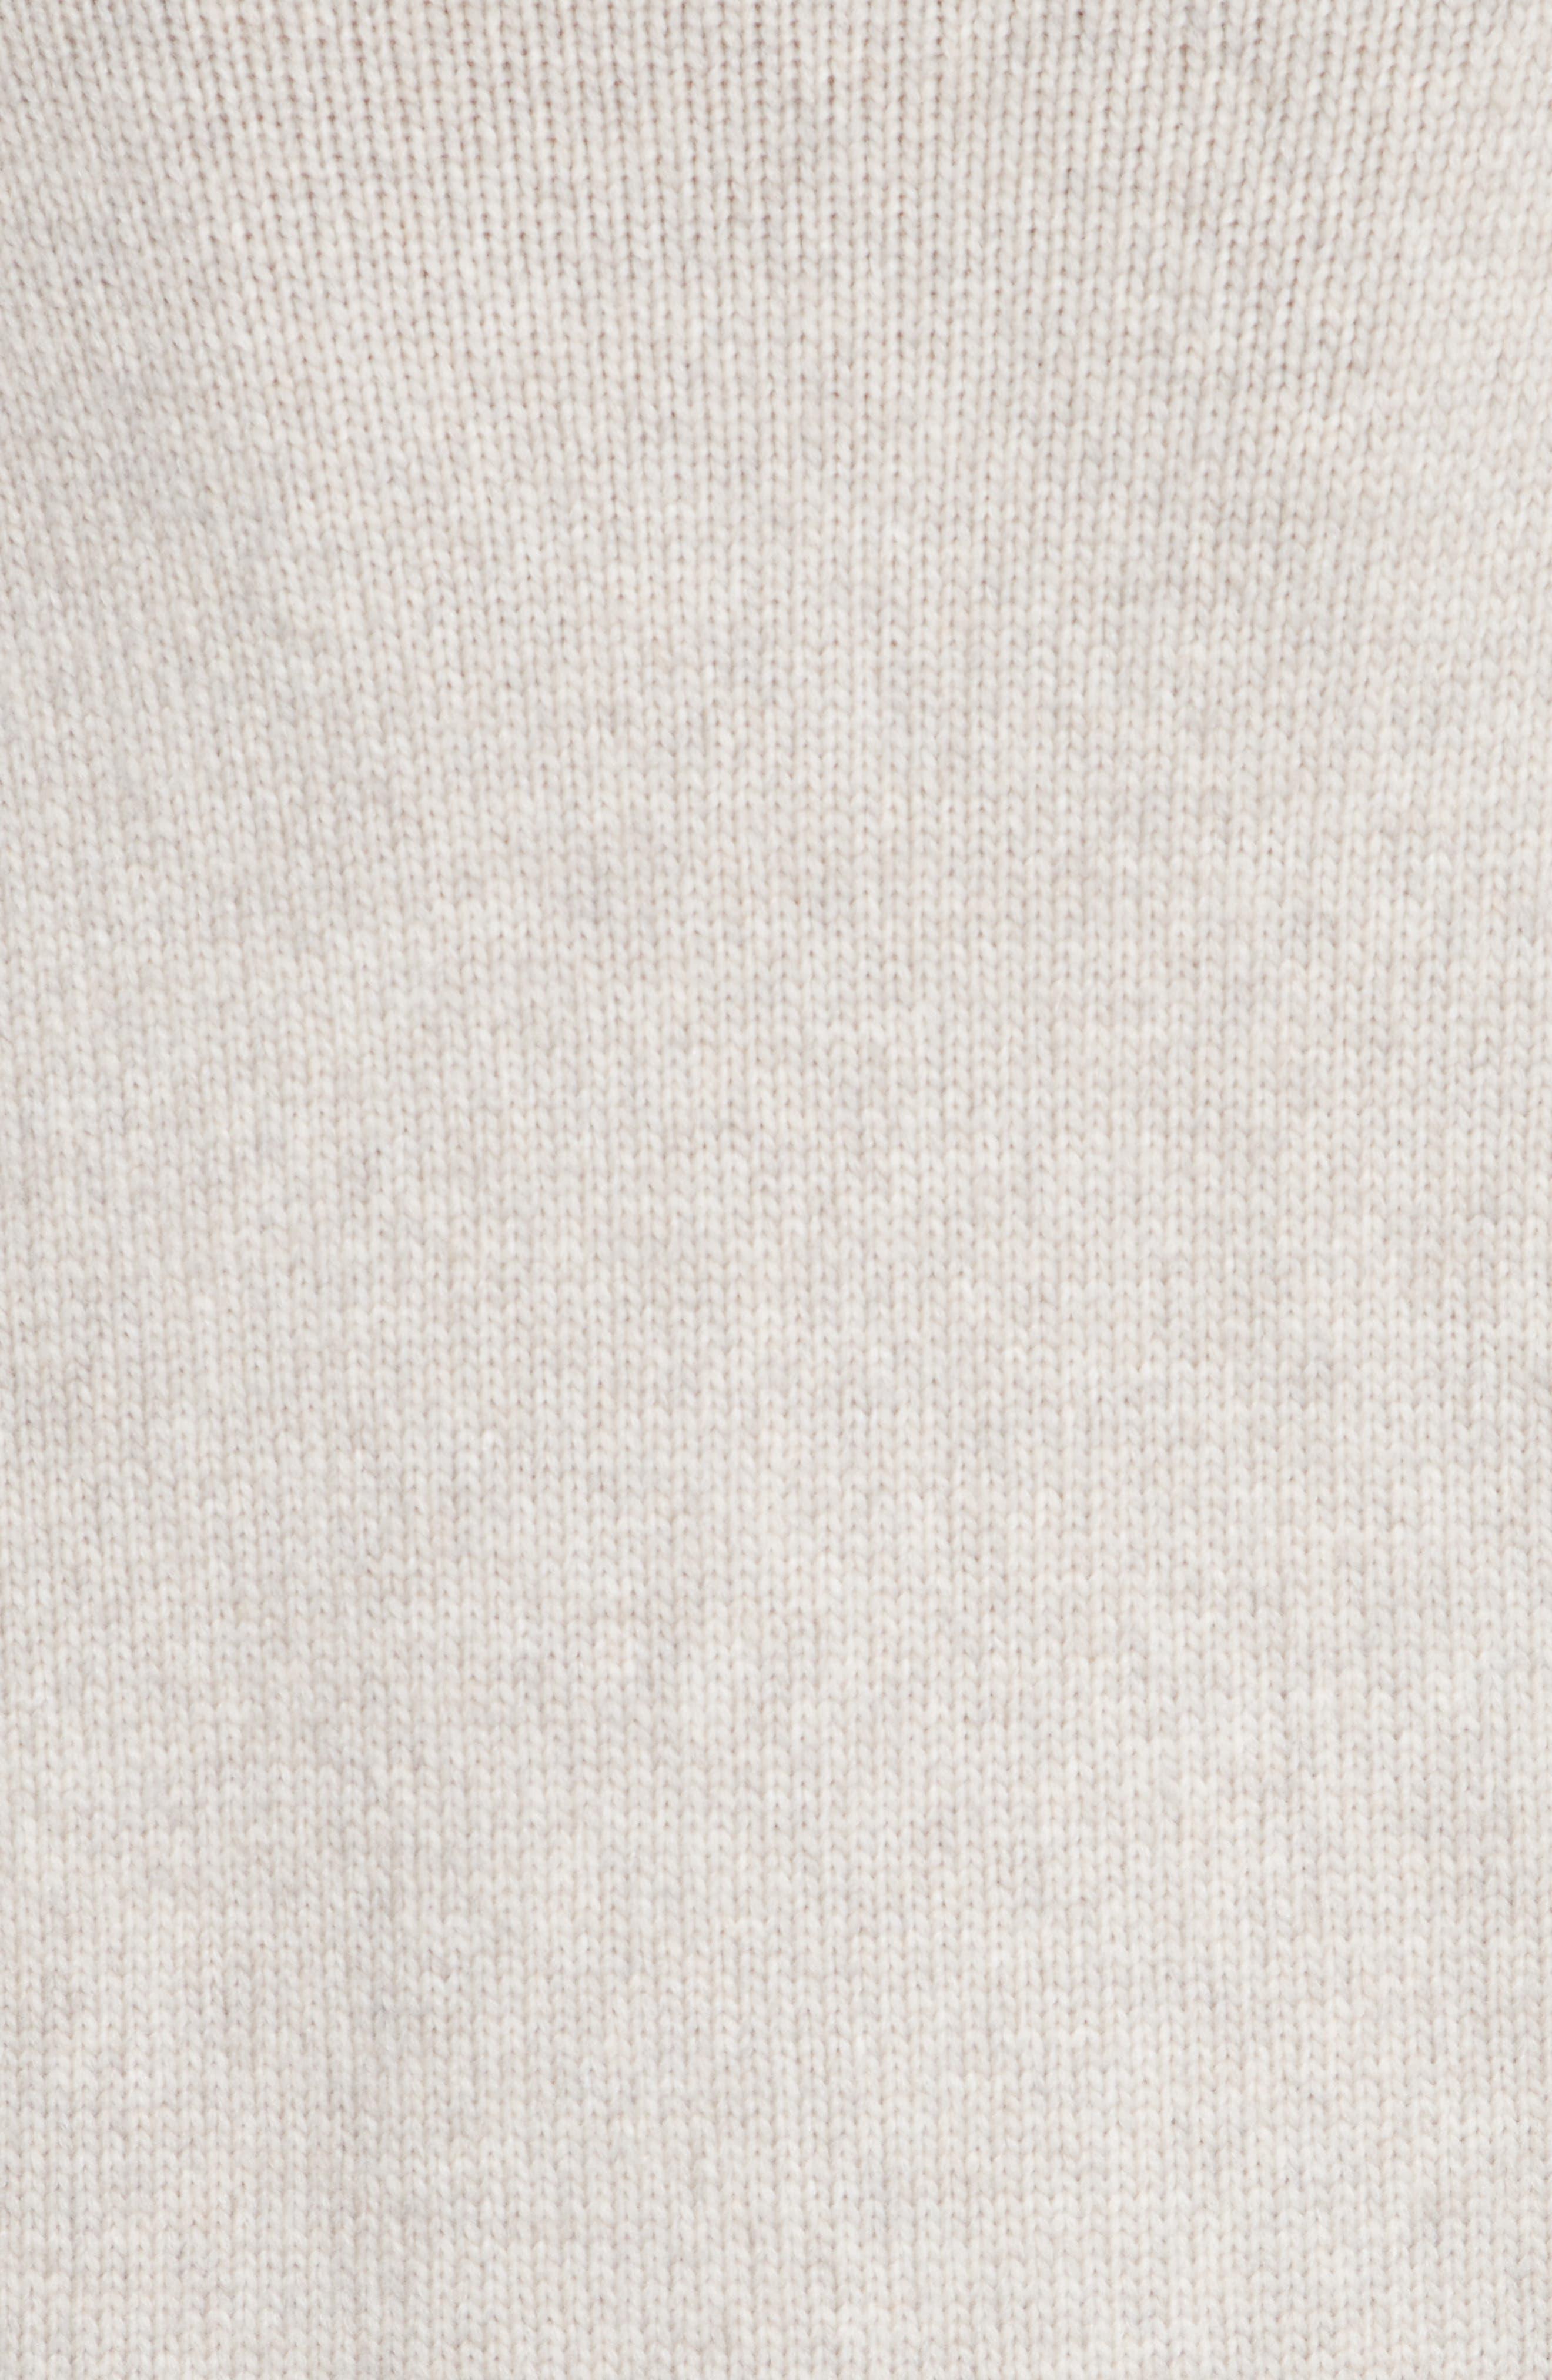 Asymmetrical Wide Neck Sweater,                             Alternate thumbnail 5, color,                             250